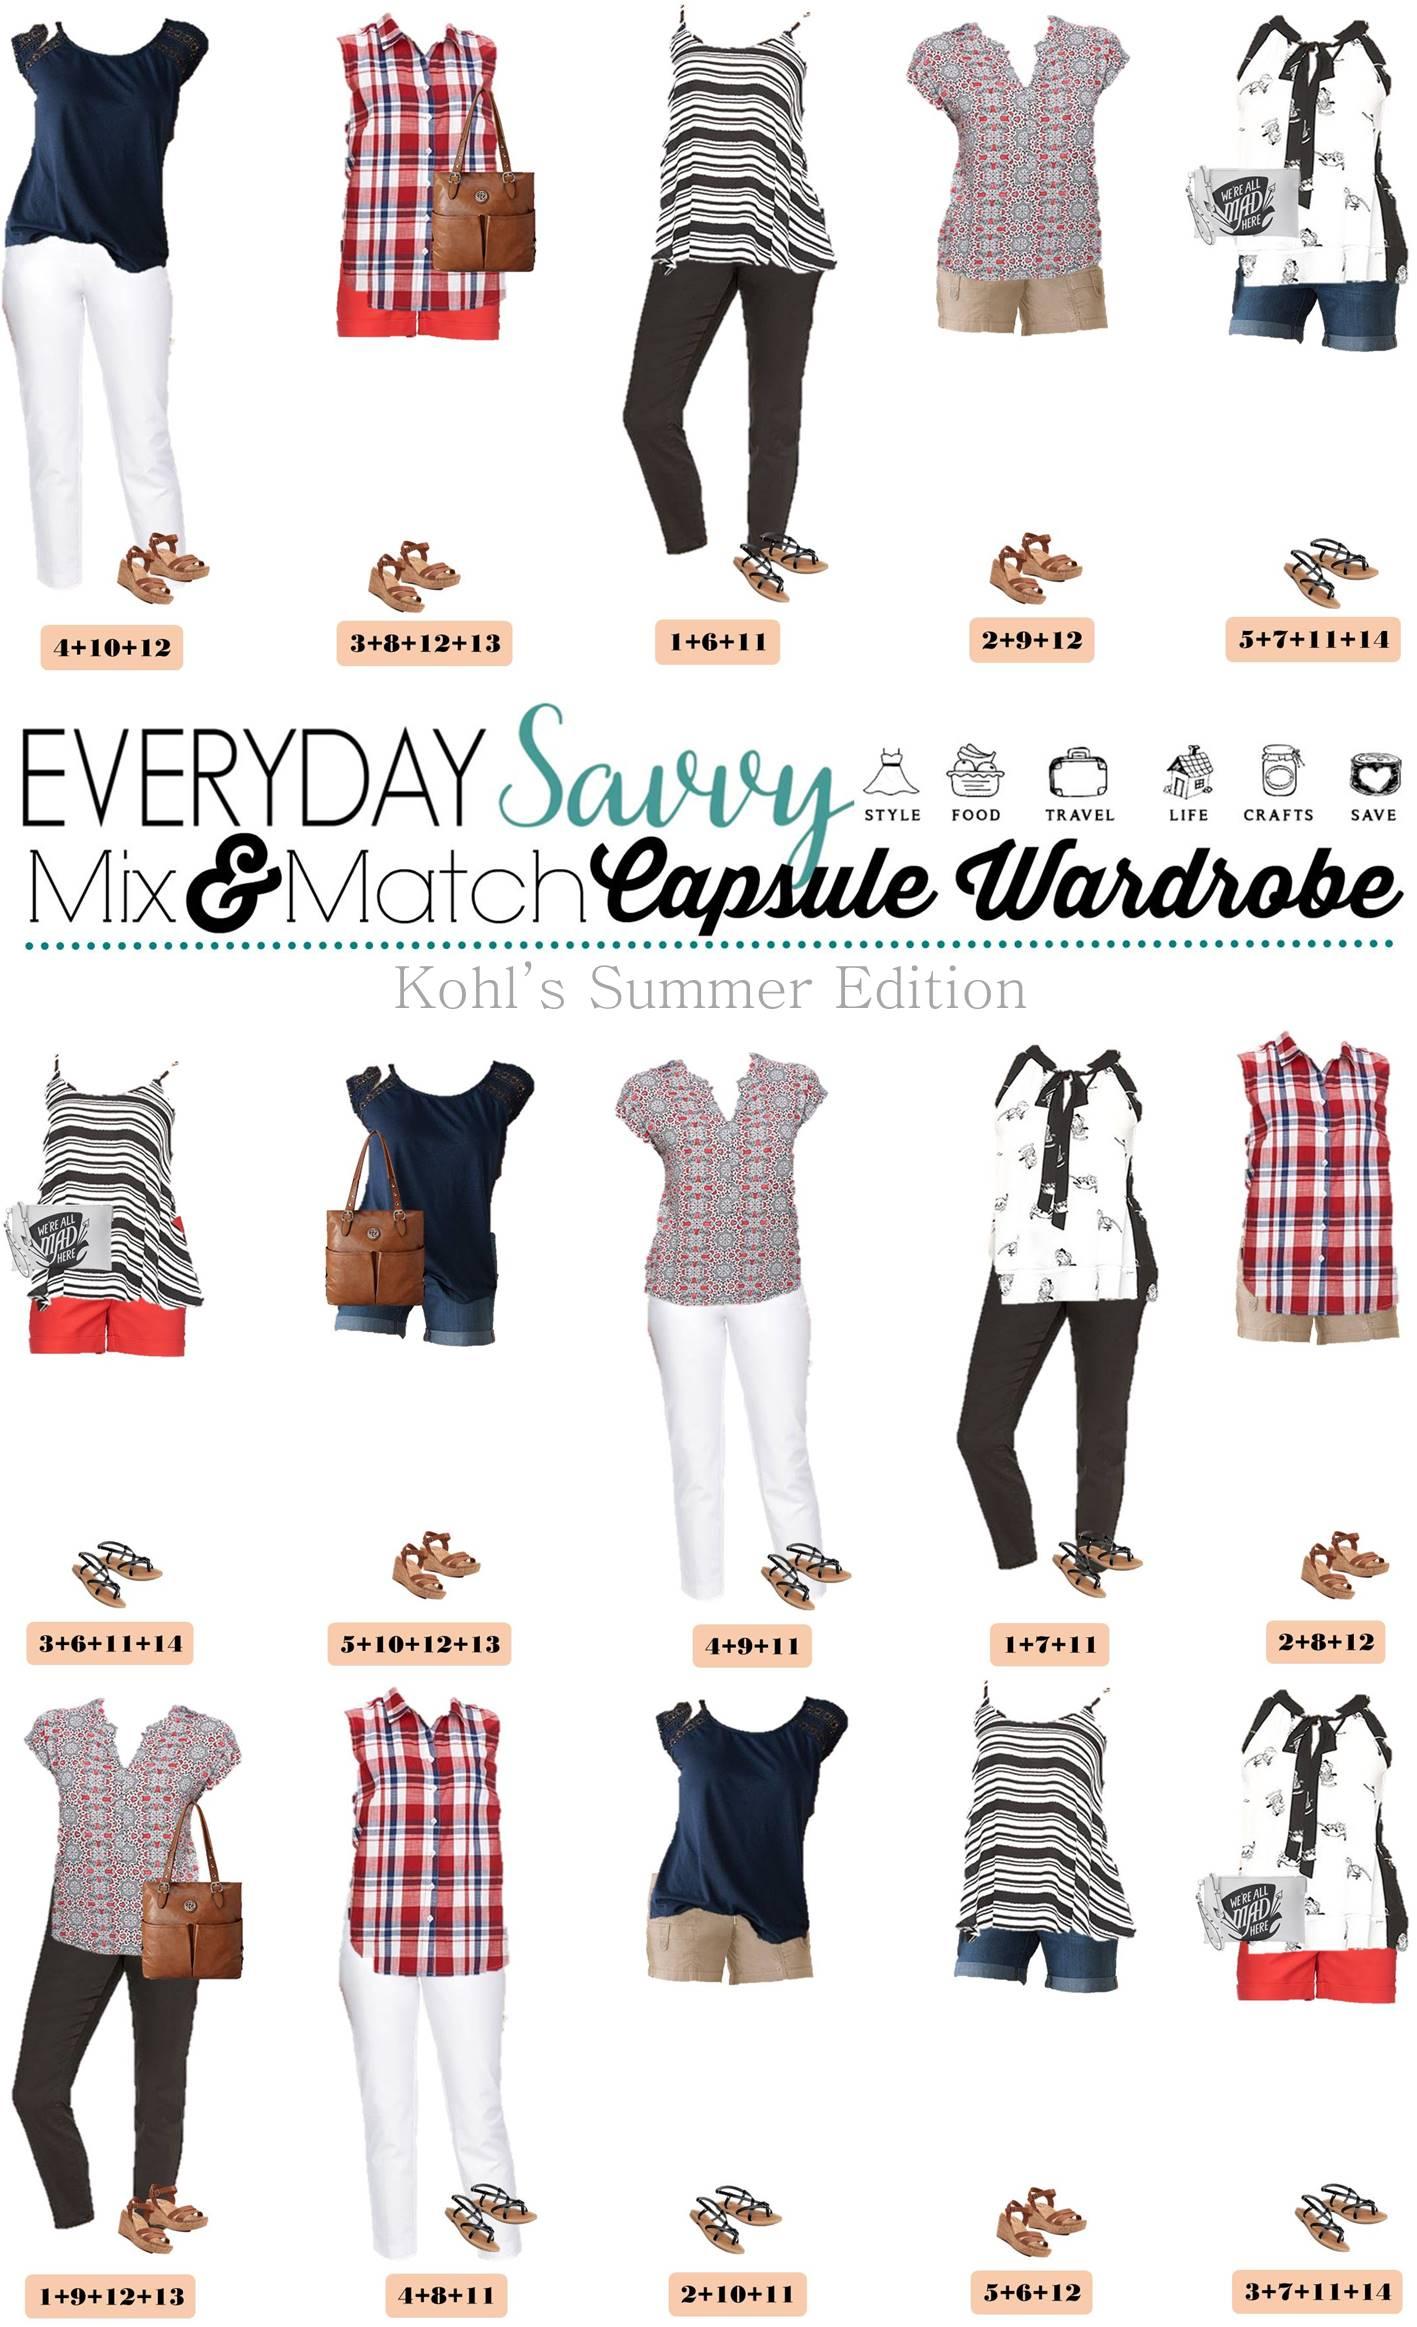 Kohls Summer Outfits Mix Amp Match Style